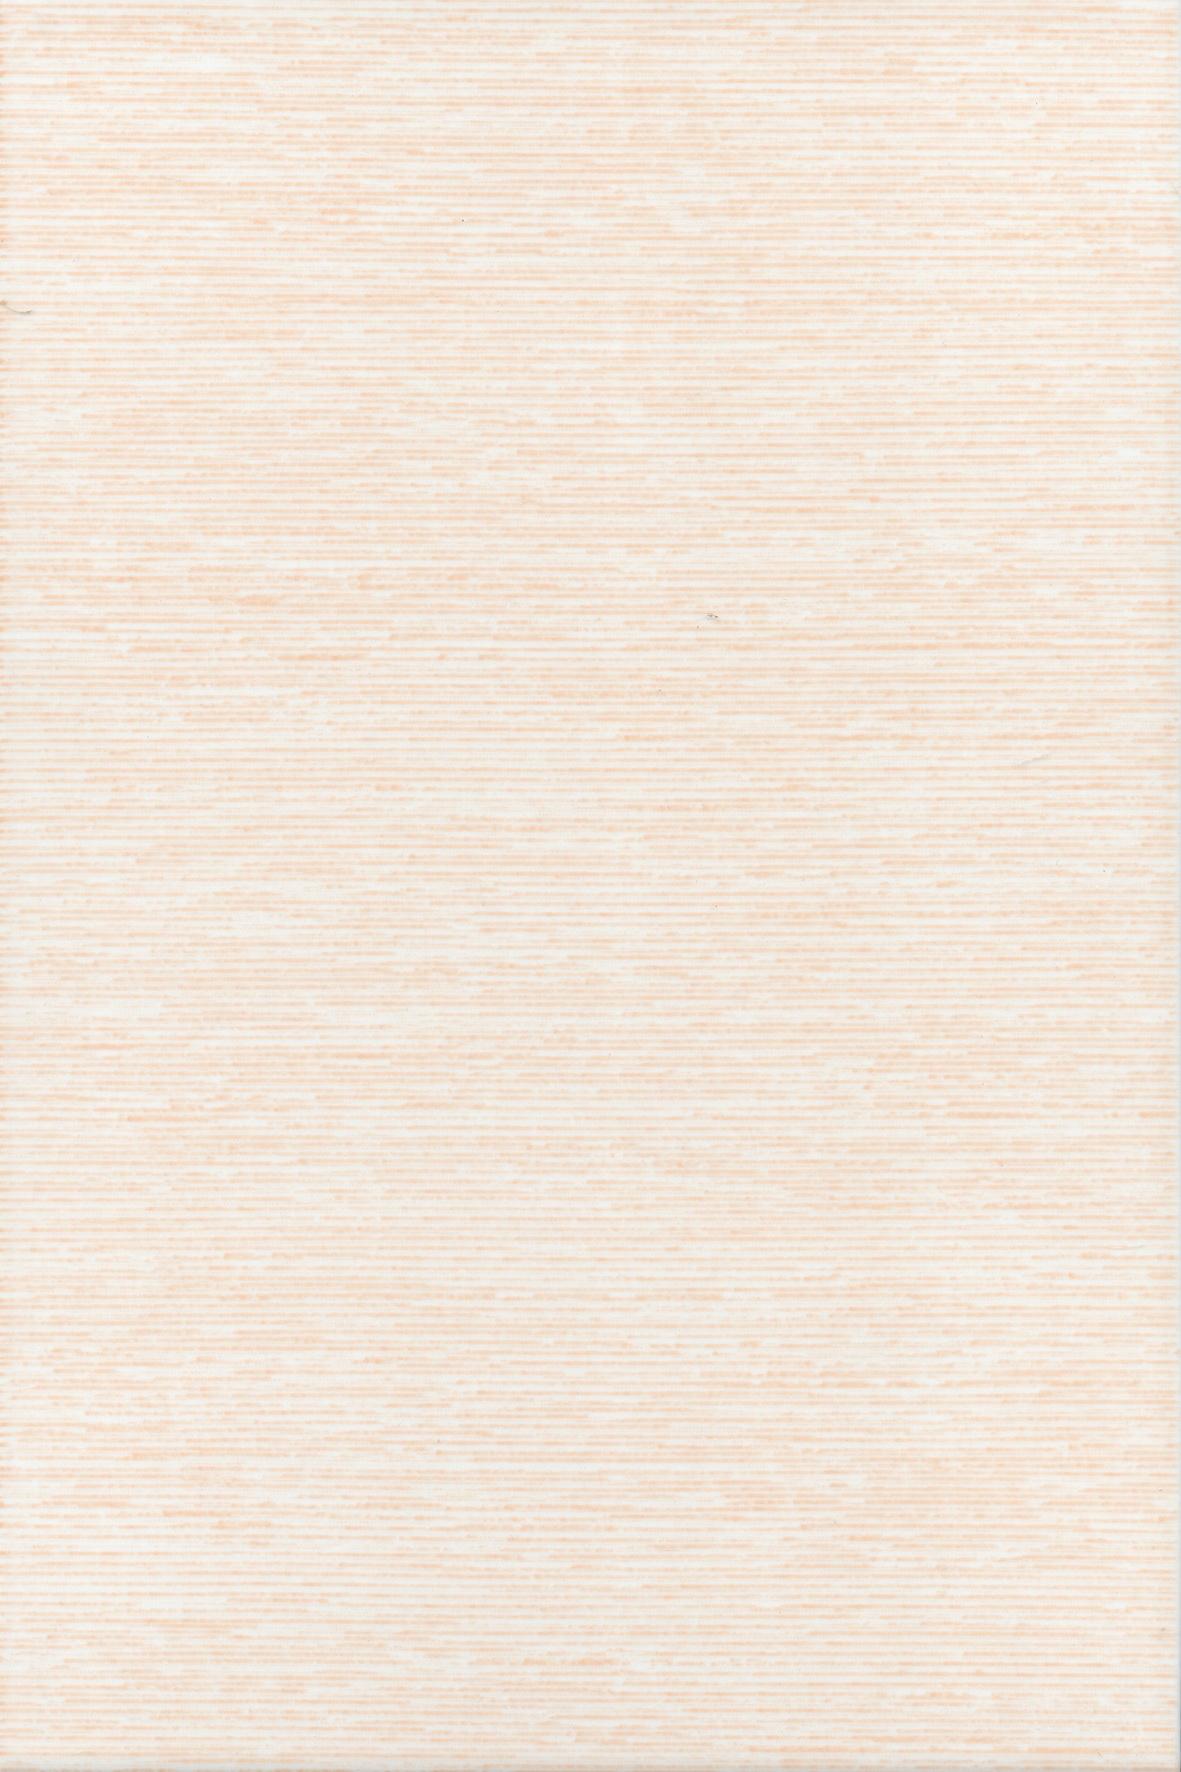 Laura настенная плитка (св-оранжевая), 20х30